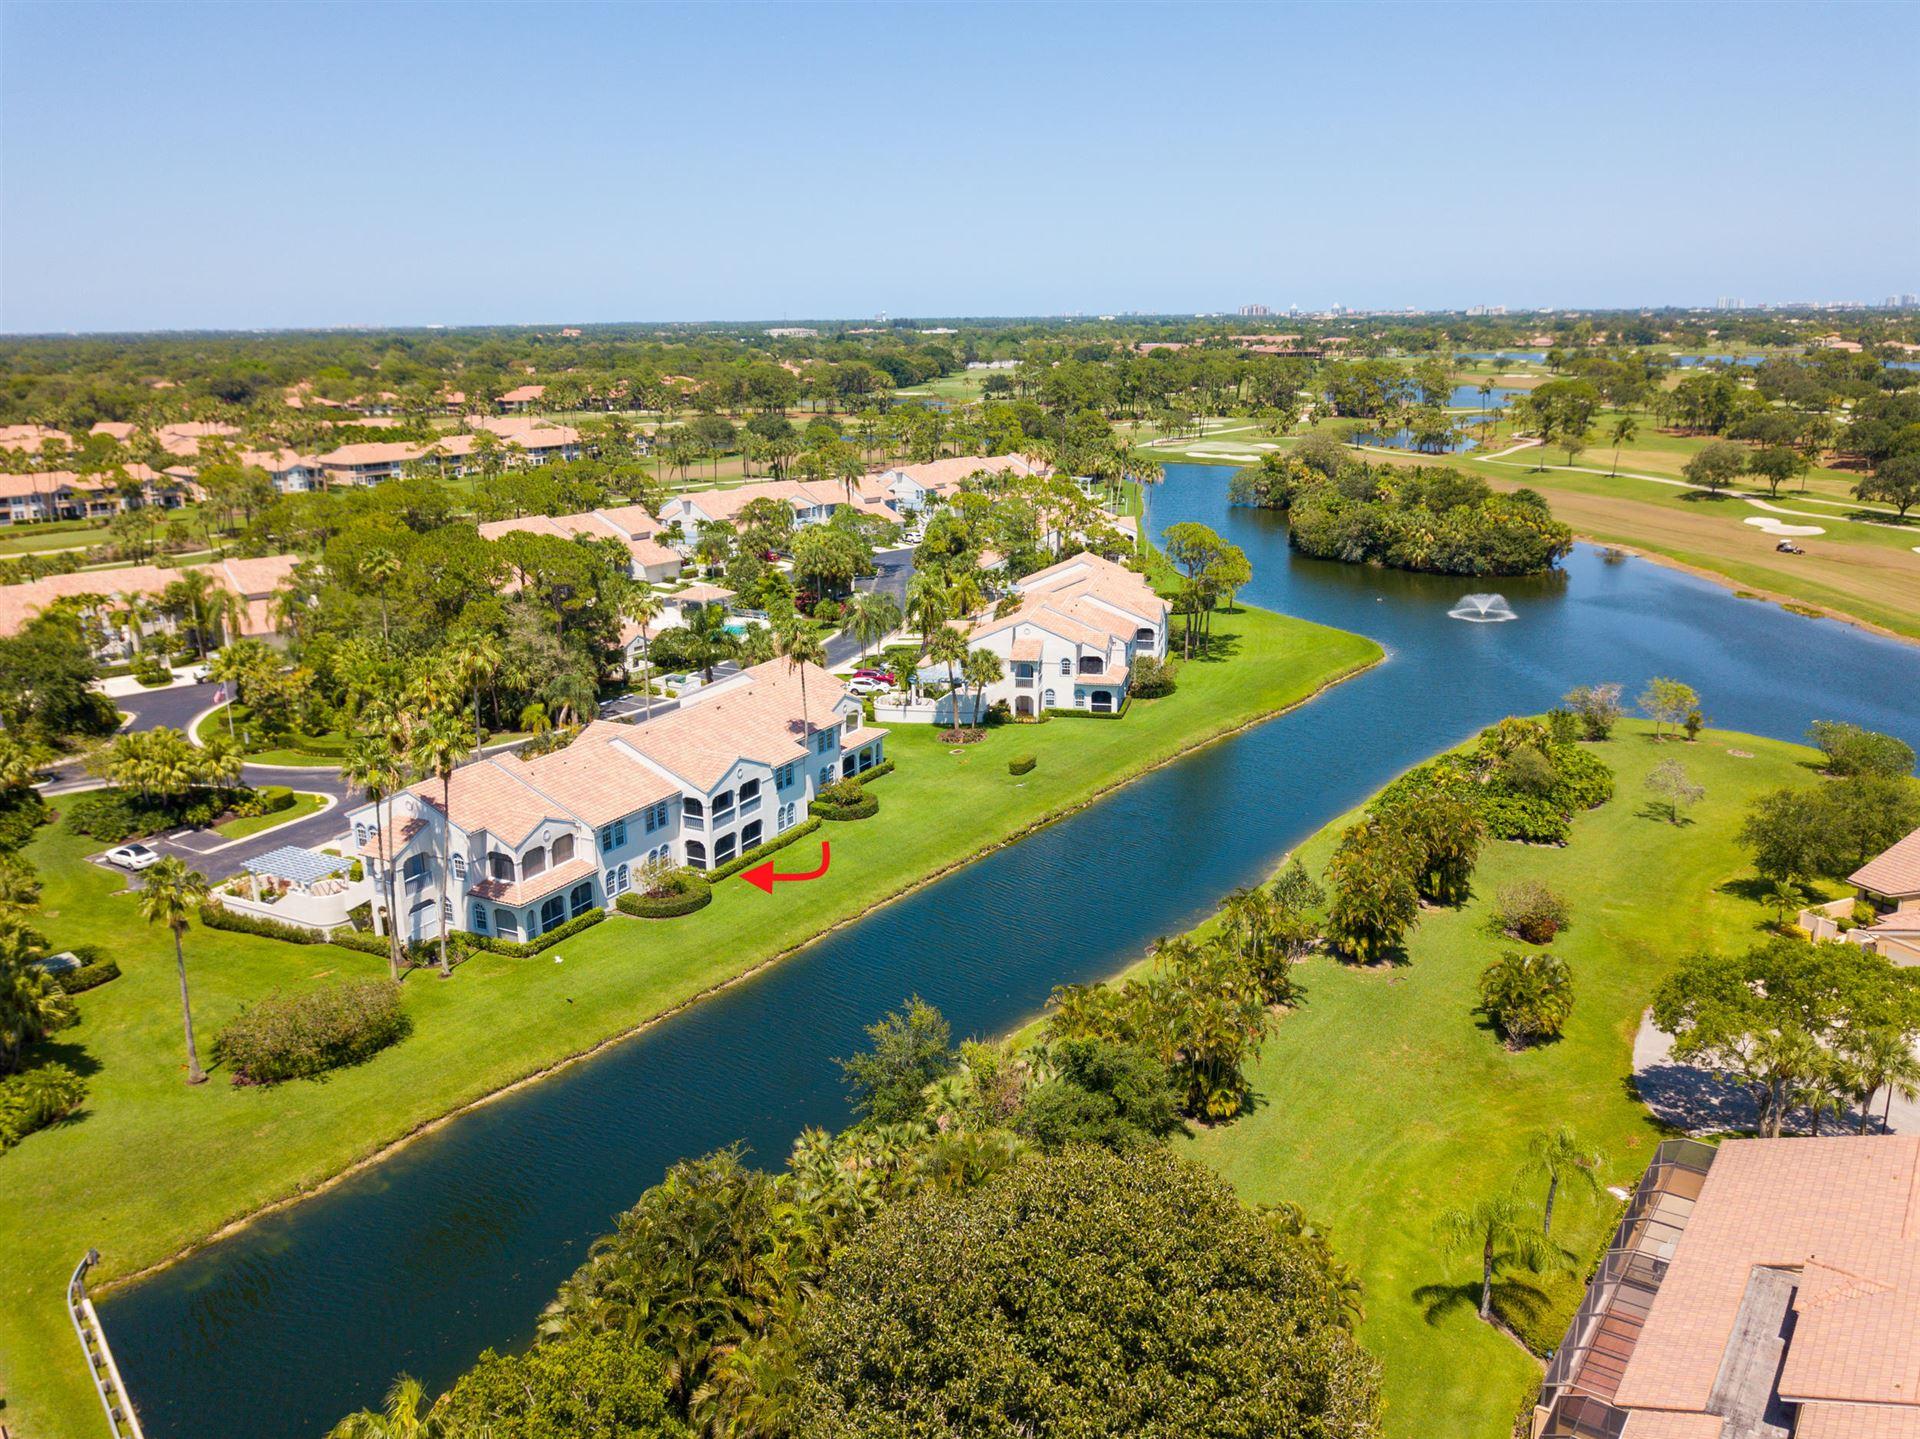 702 Ryder Cup Circle S, Palm Beach Gardens, FL 33418 - #: RX-10681582